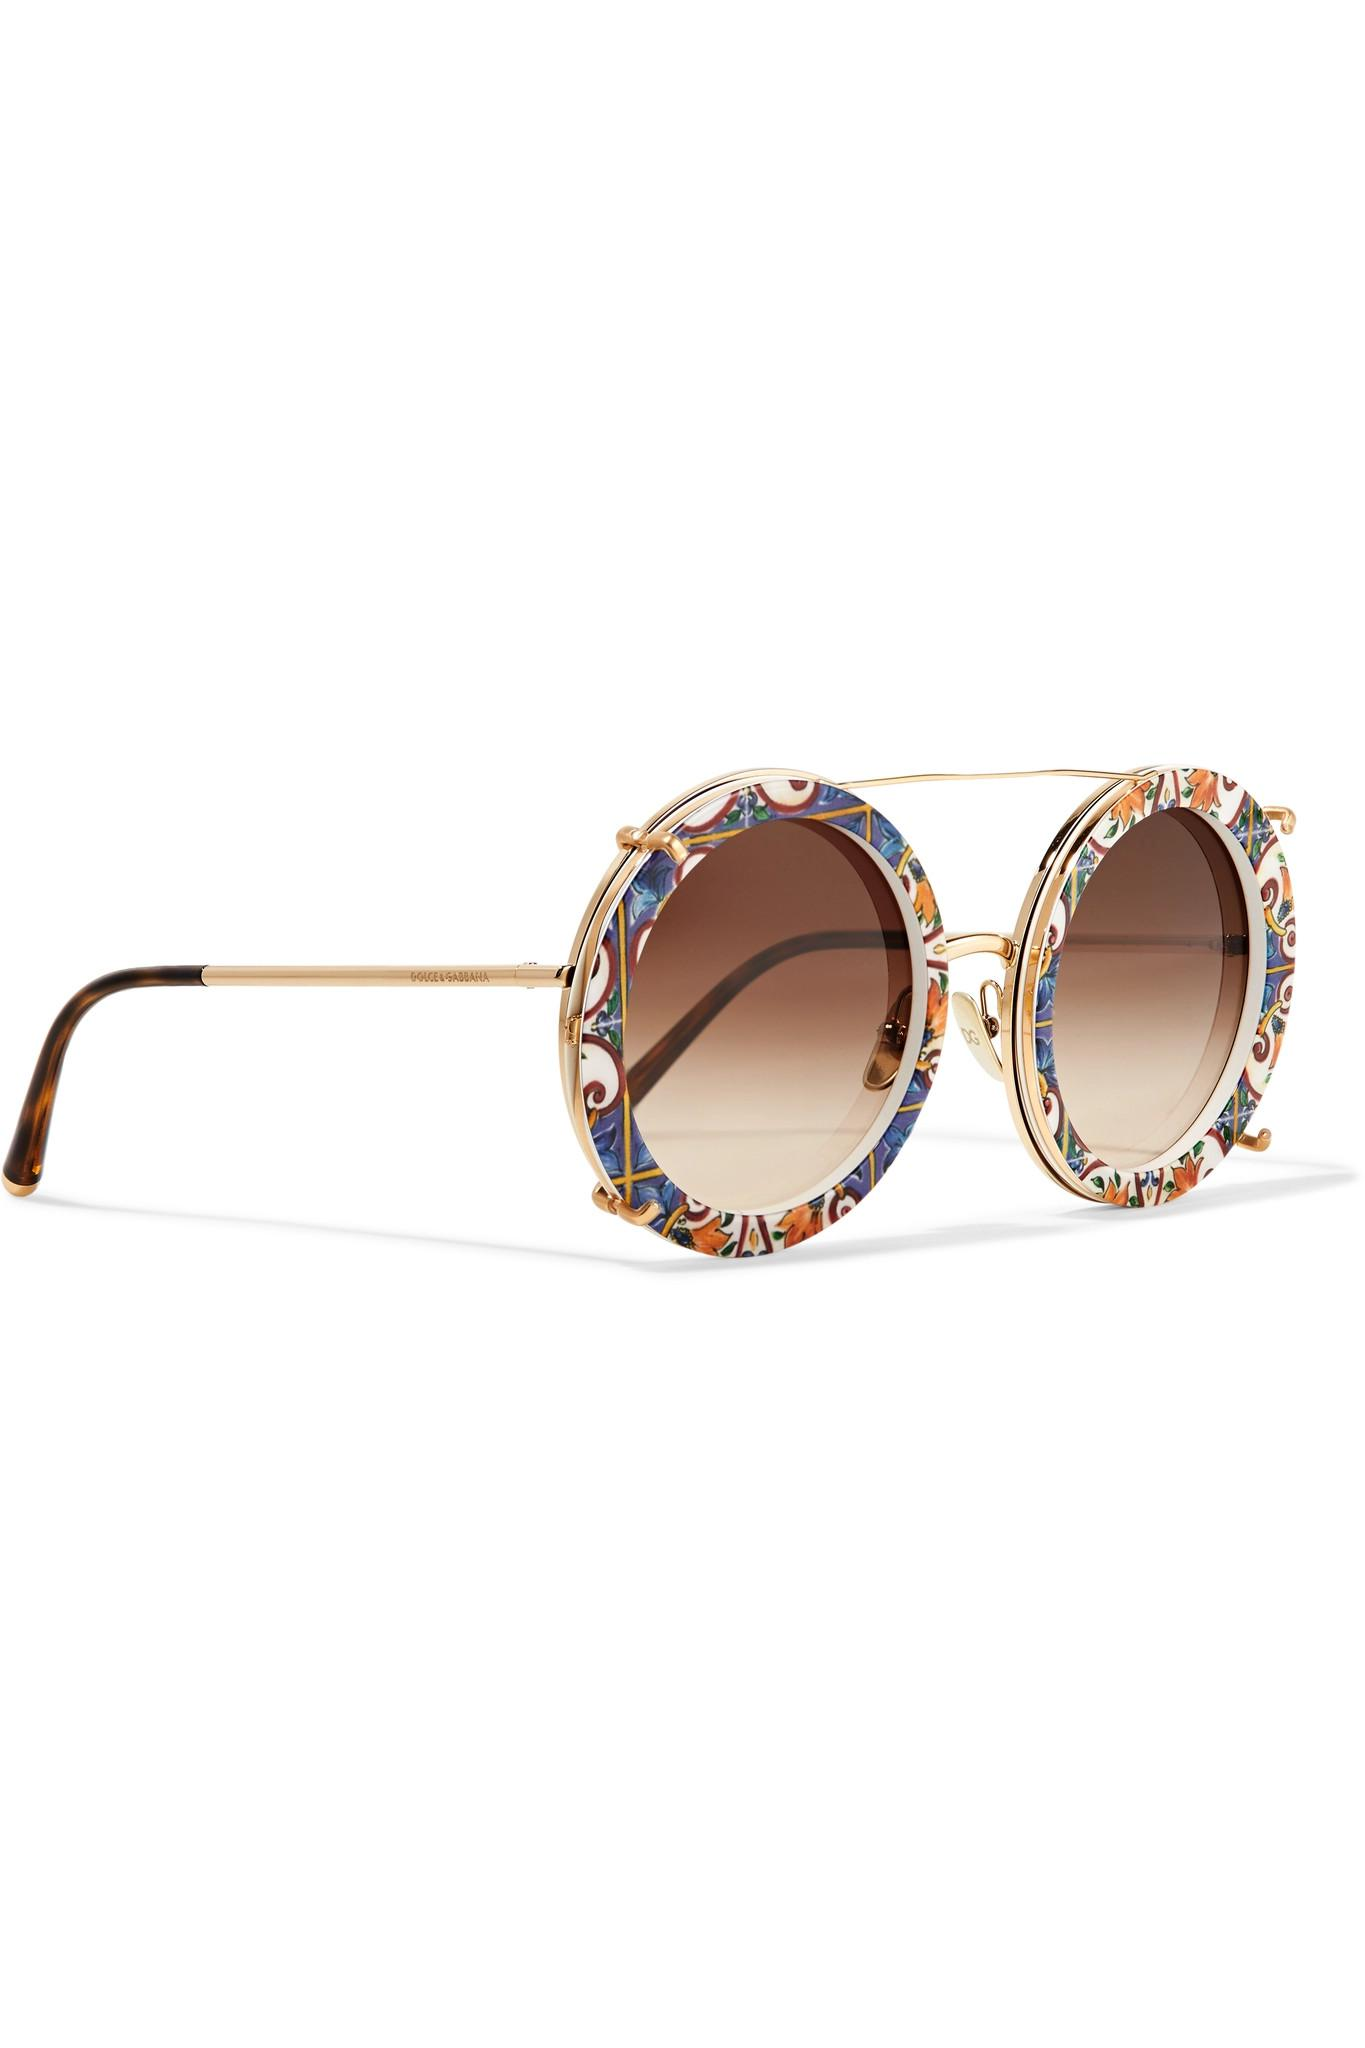 af0f8f25ae6c Dolce   Gabbana - Metallic Round-frame Printed Acetate And Gold-tone  Convertible Sunglasses. View fullscreen